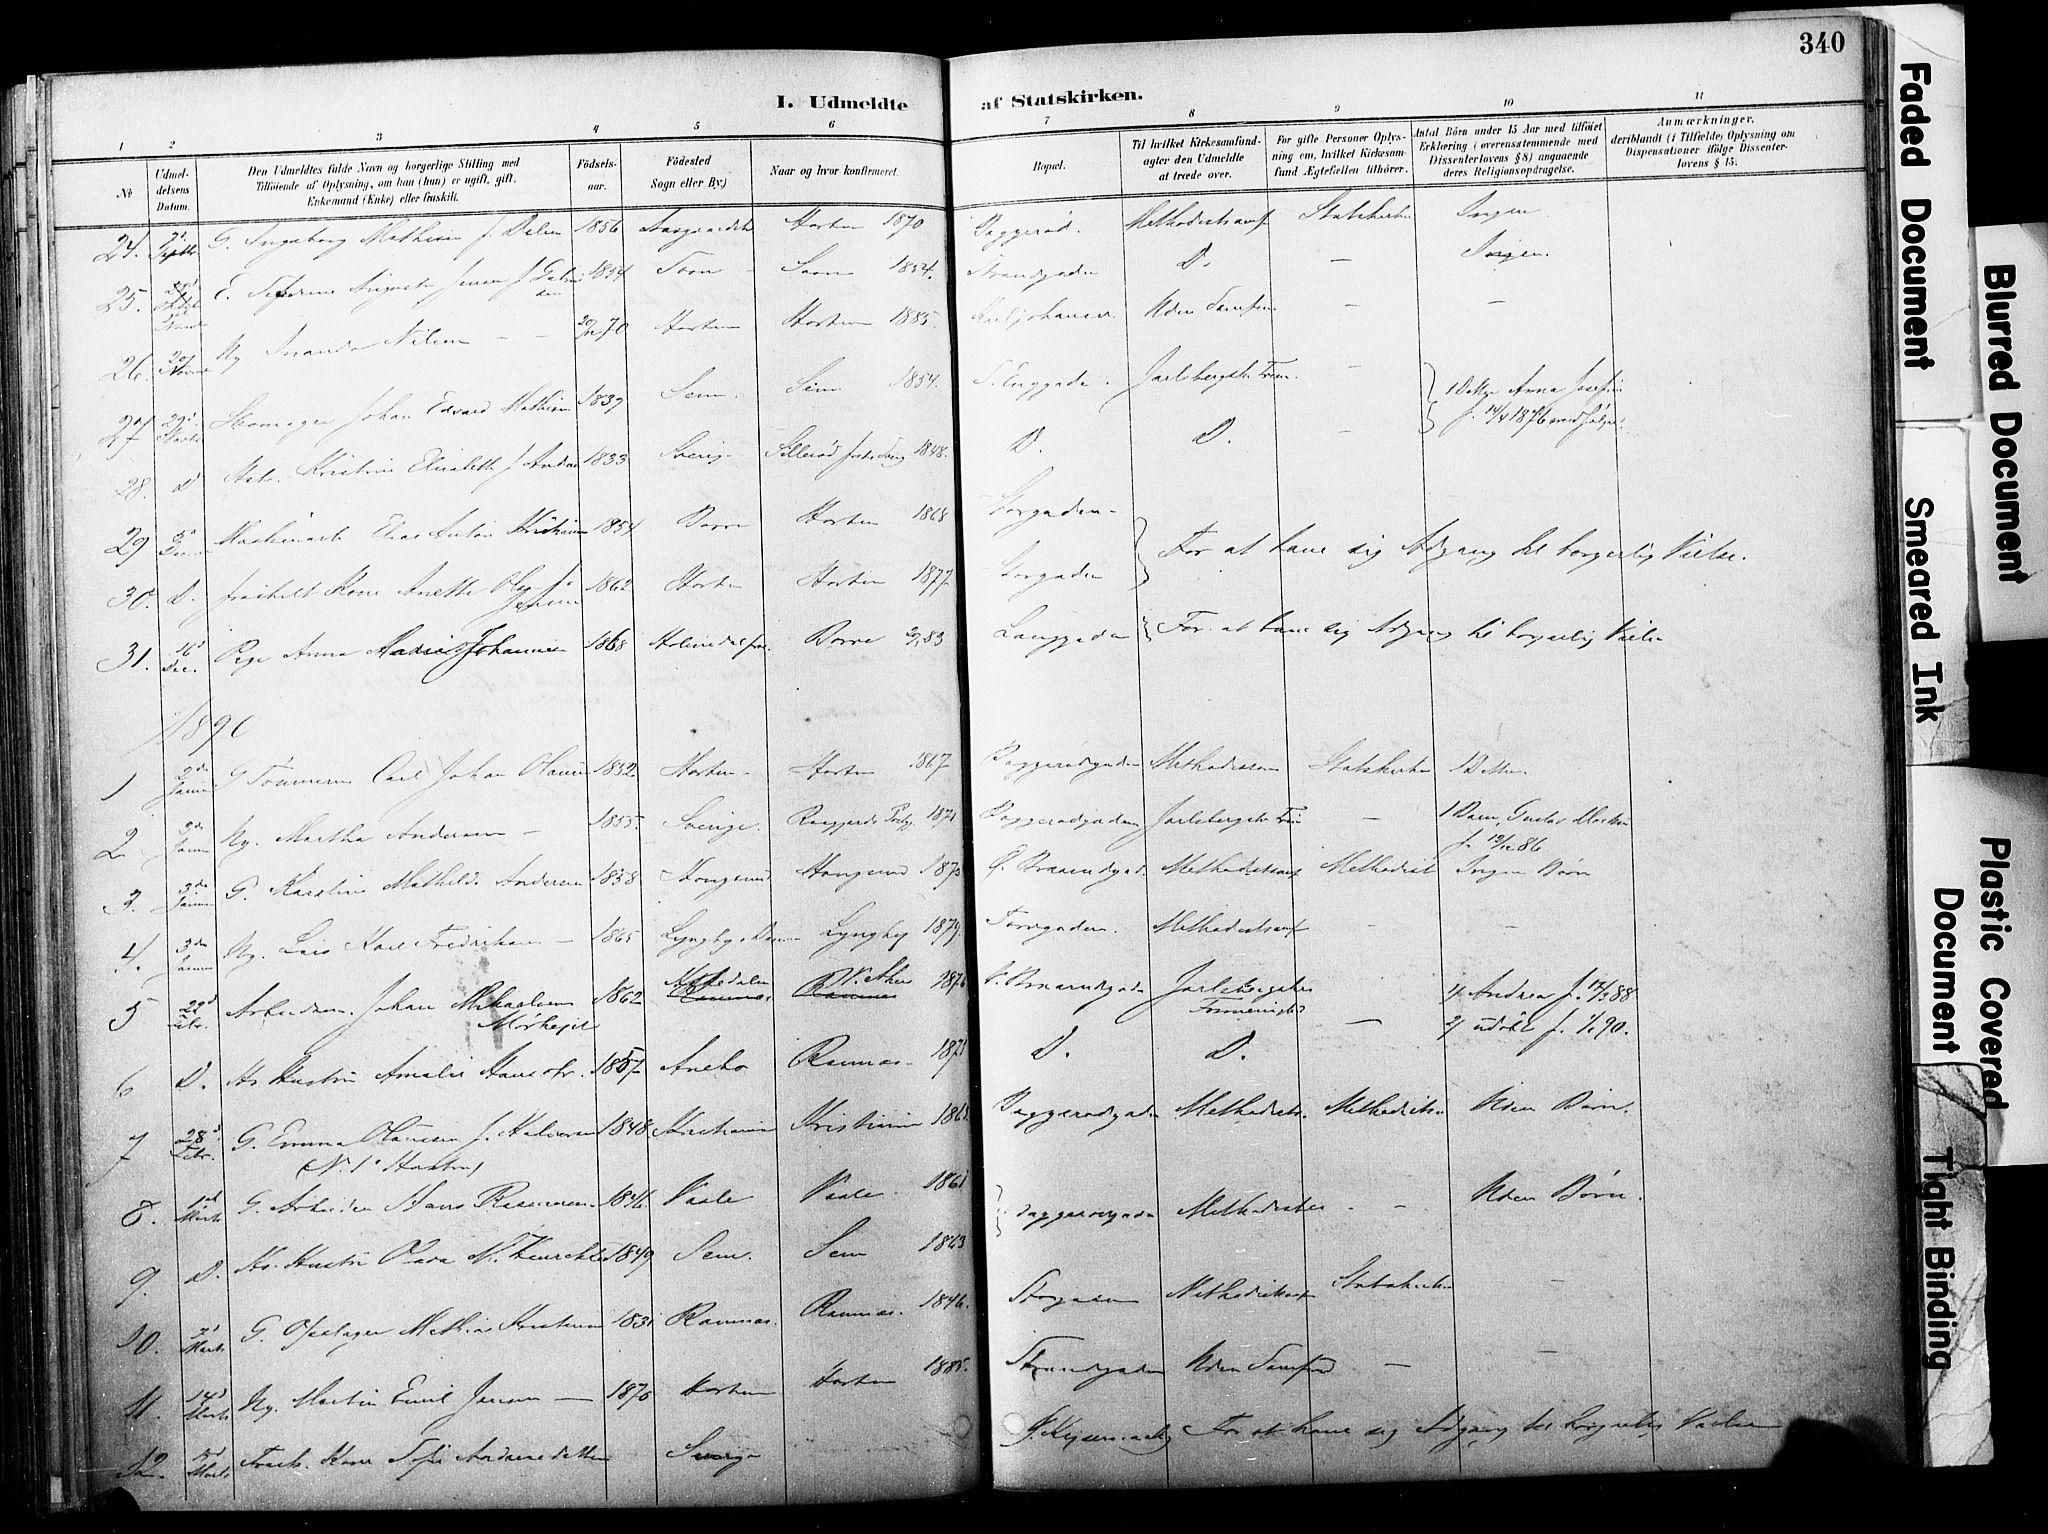 SAKO, Horten kirkebøker, F/Fa/L0004: Parish register (official) no. 4, 1888-1895, p. 340